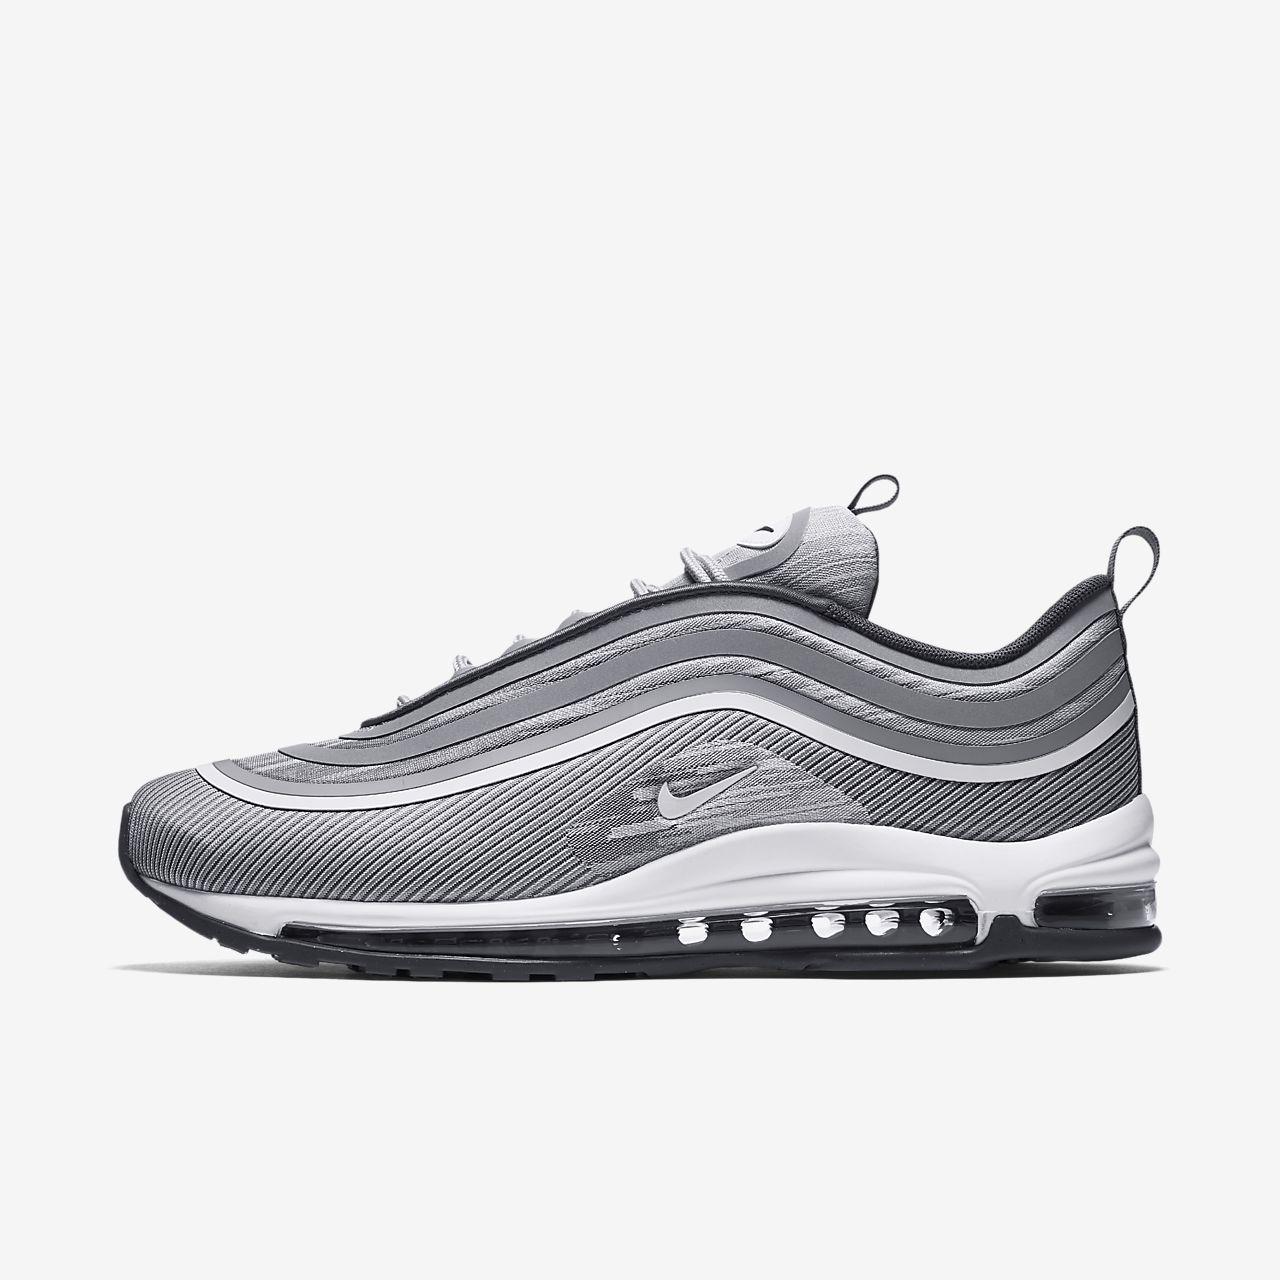 scarpe nike air max 97 ul uomo